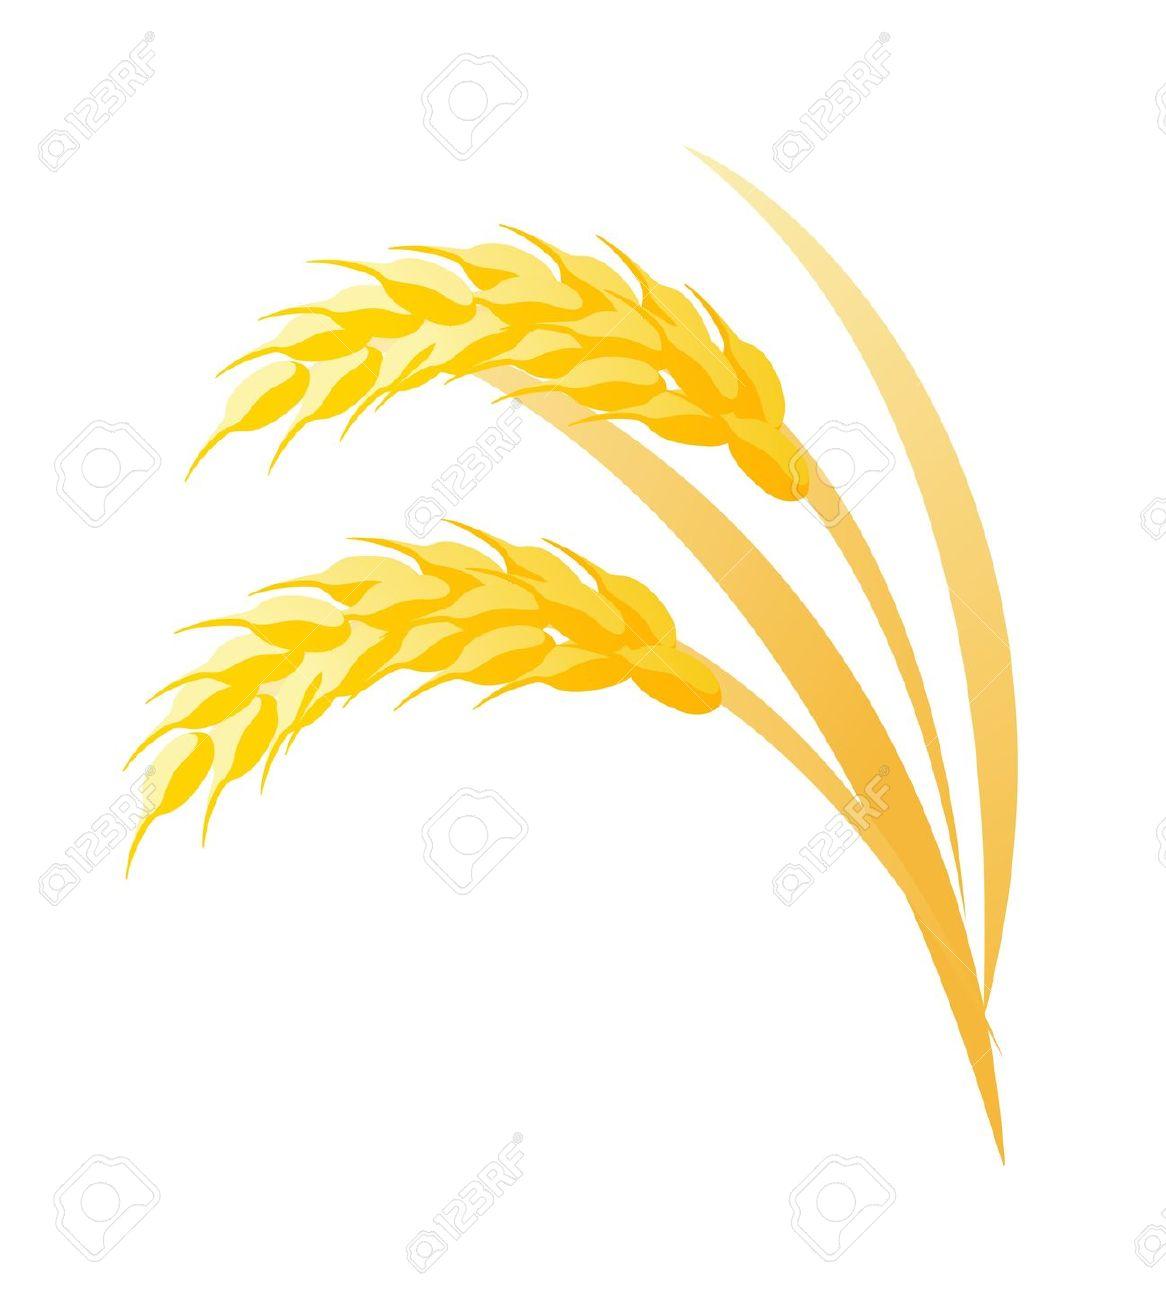 Rice grain clipart » Clipart Station.